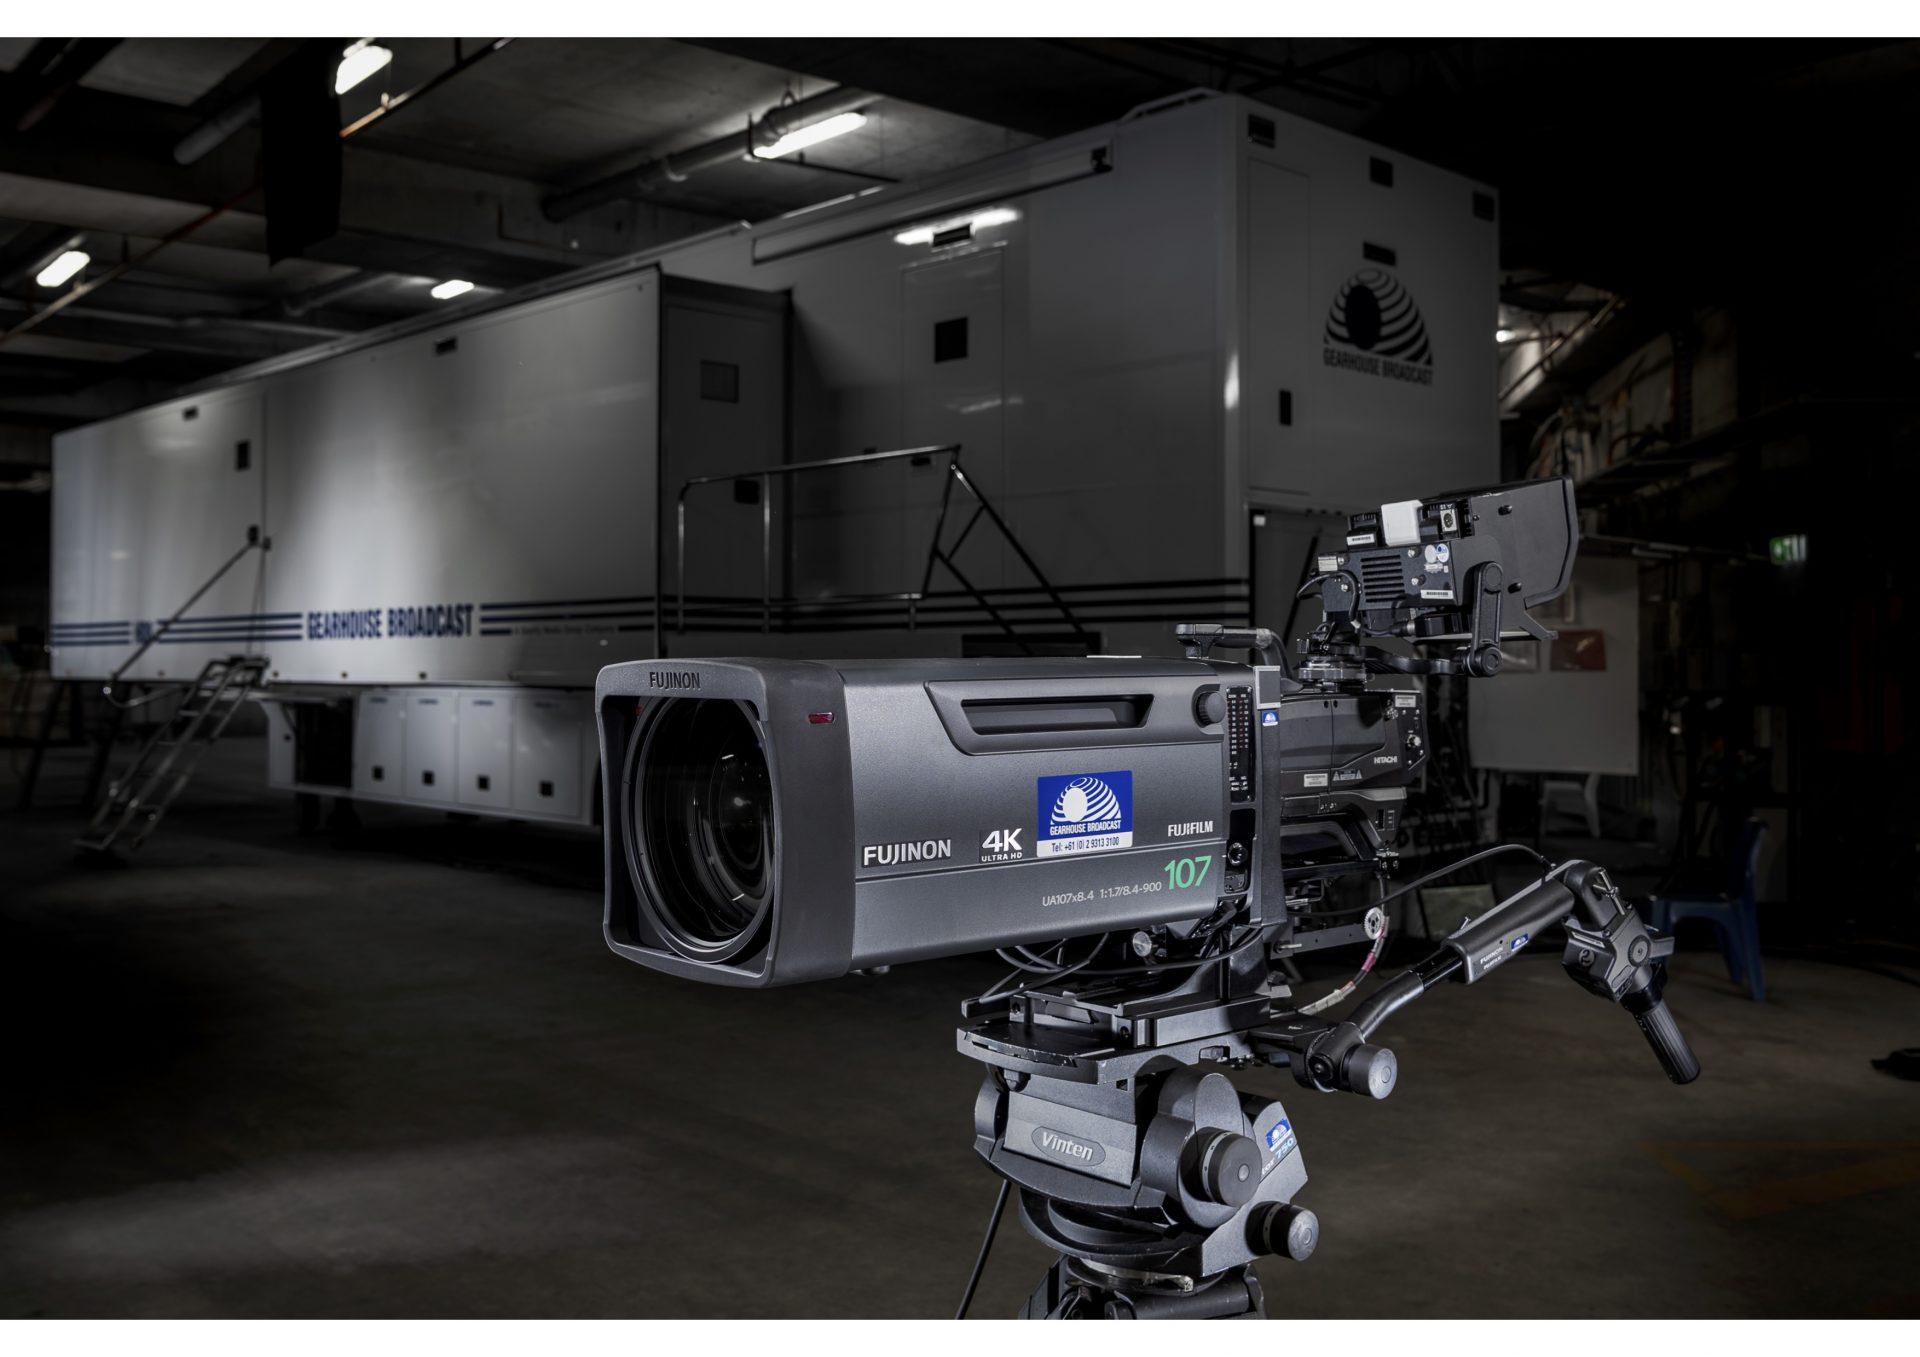 Gearhouse Broadcast acquires new 4K/UHD Fujinon lenses